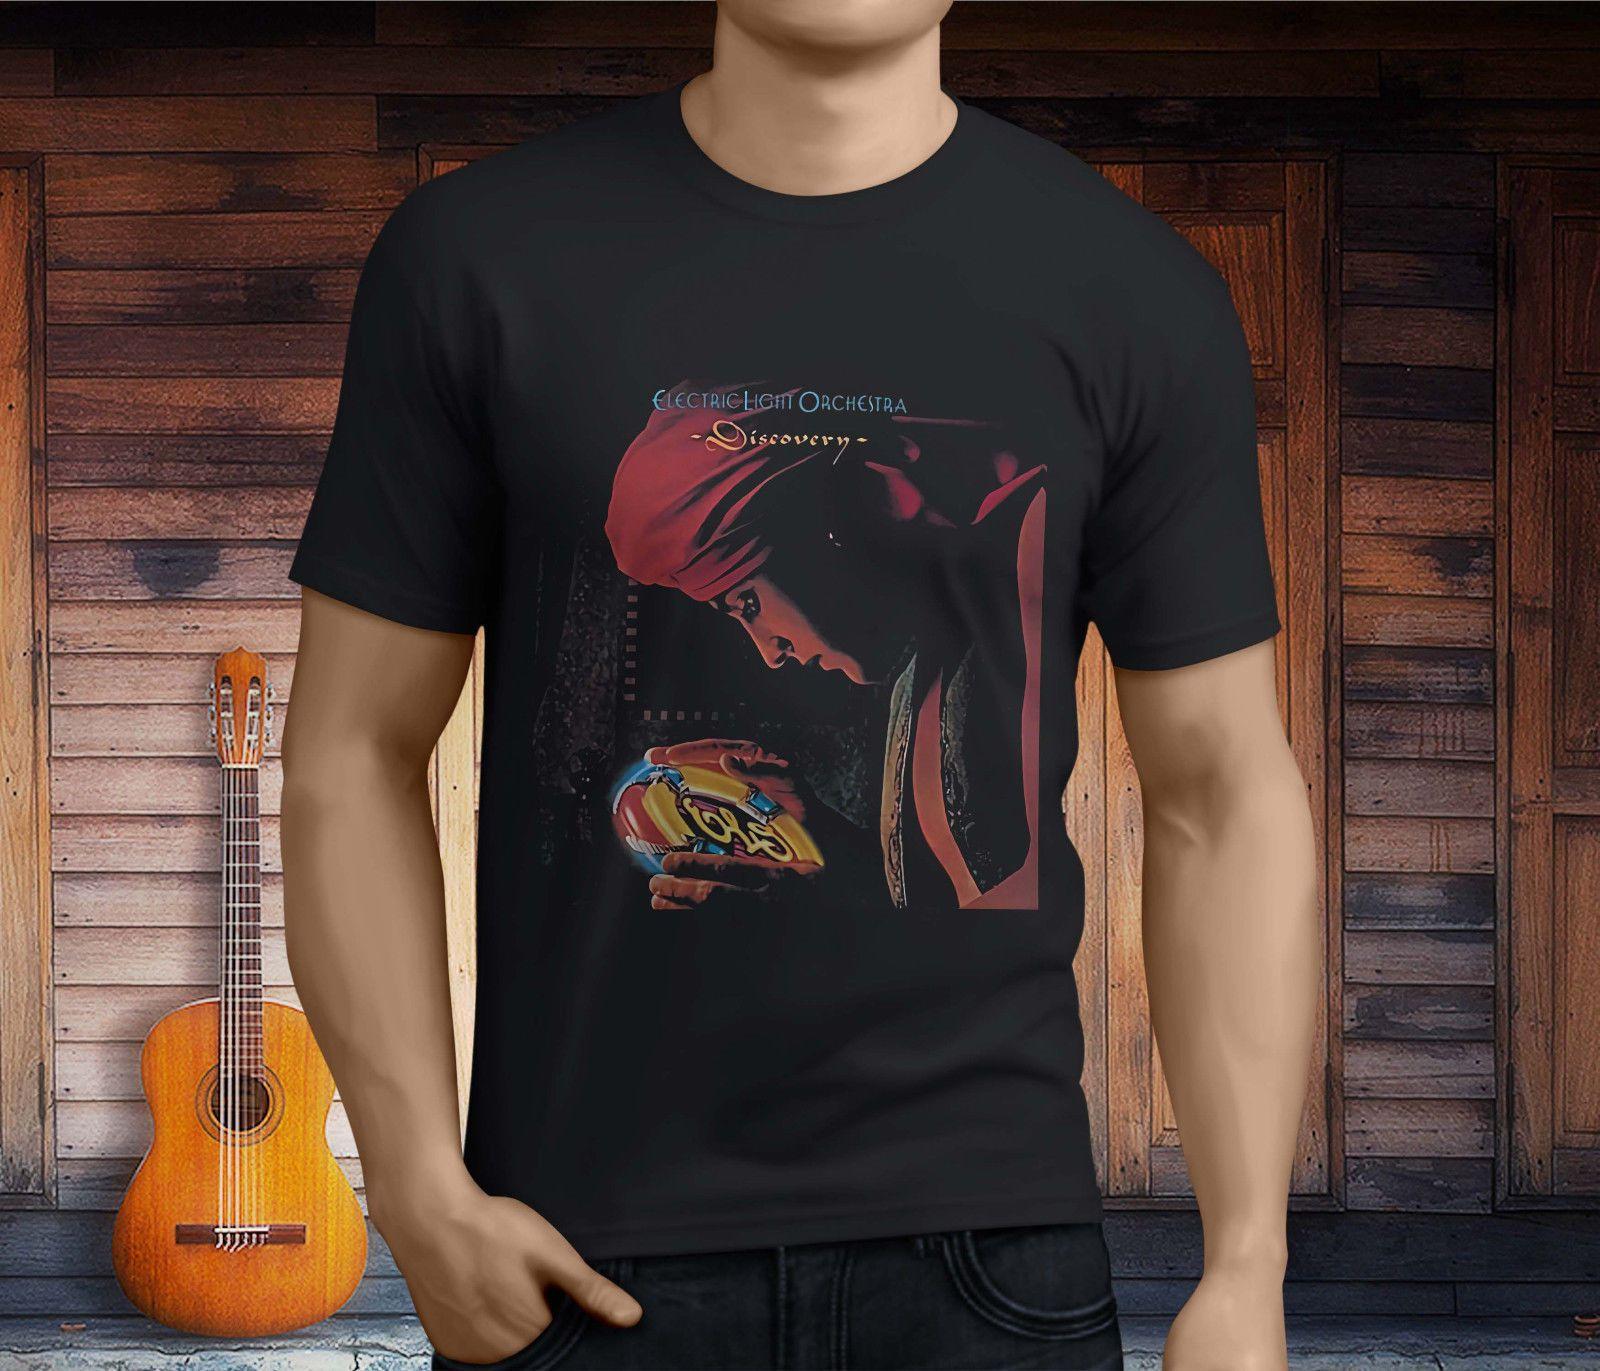 2397ed8239 Compre Nuevo ELO Electric Light Orchestra Discovery Music Camiseta Negra  Para Hombre Talla S 3XL A  11.01 Del Funnytee